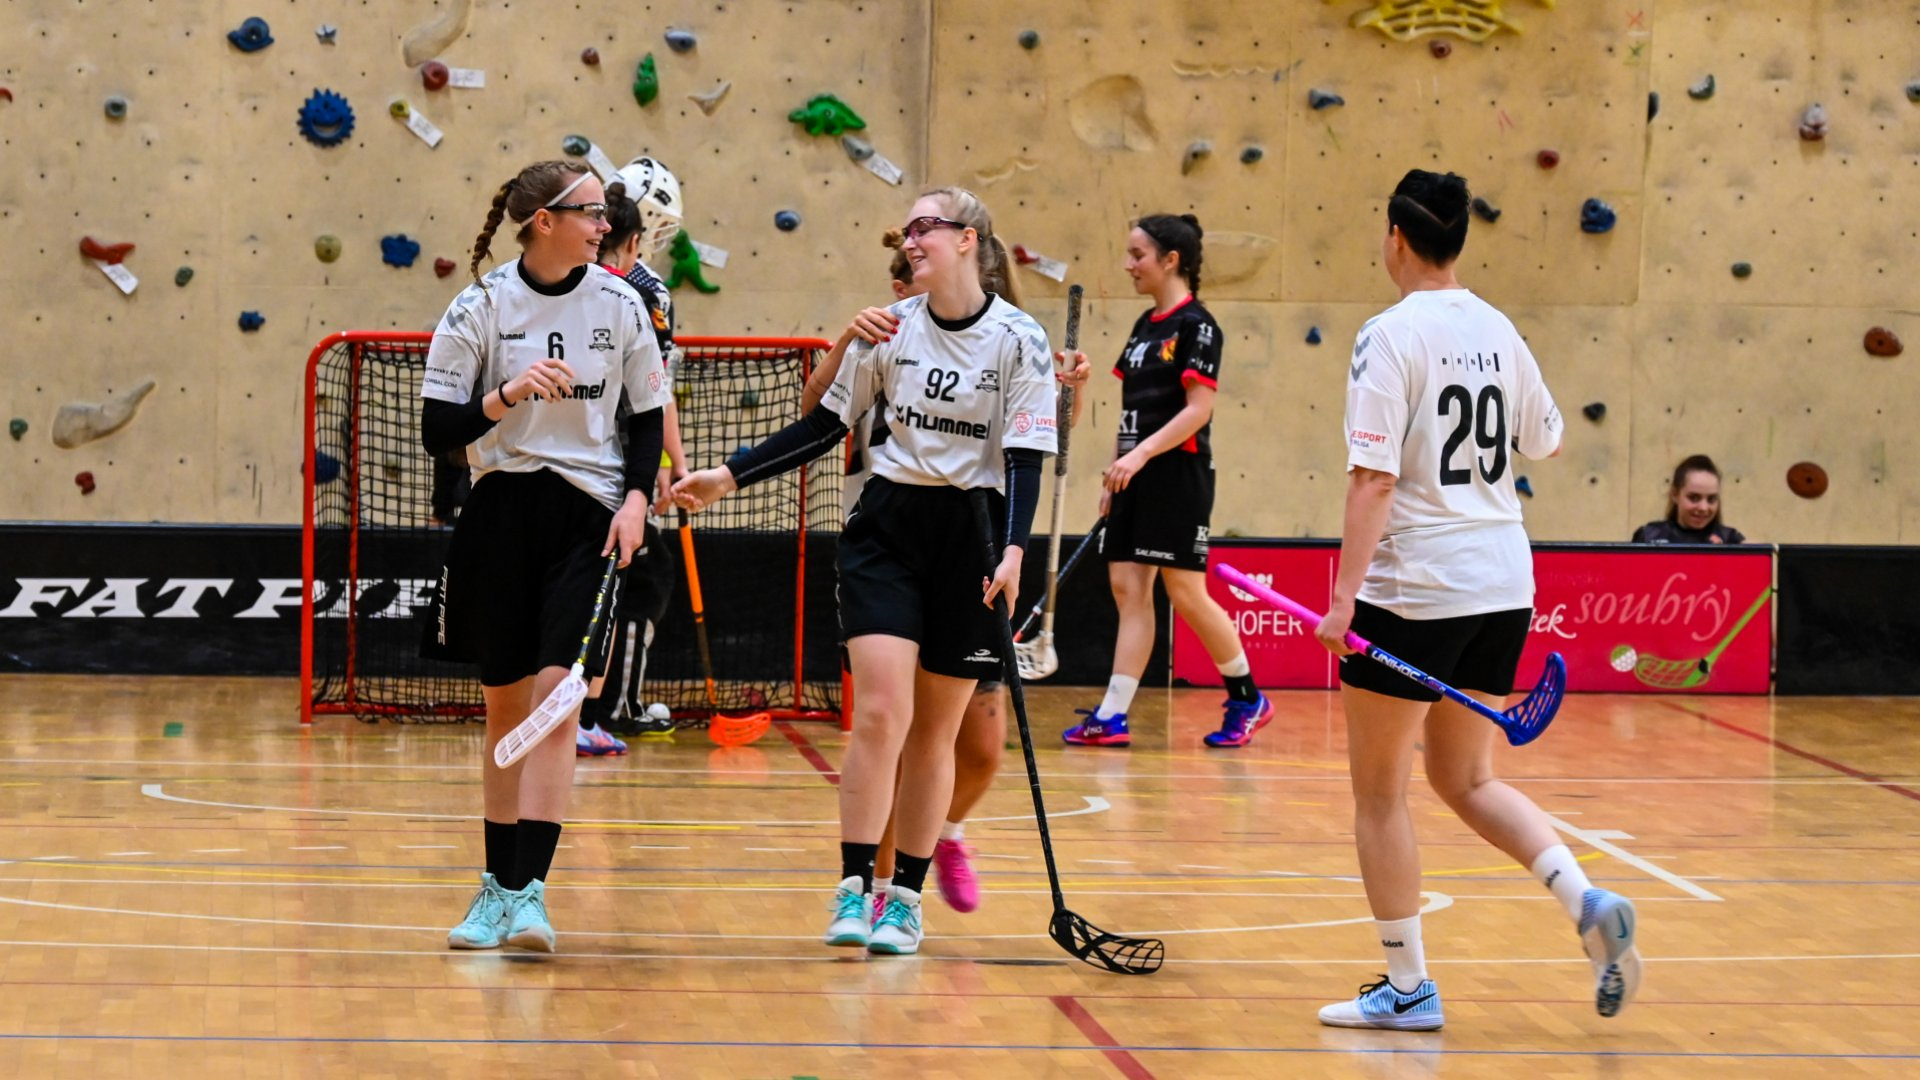 Ženy začaly svoji historii na turnaji ve Znojmě